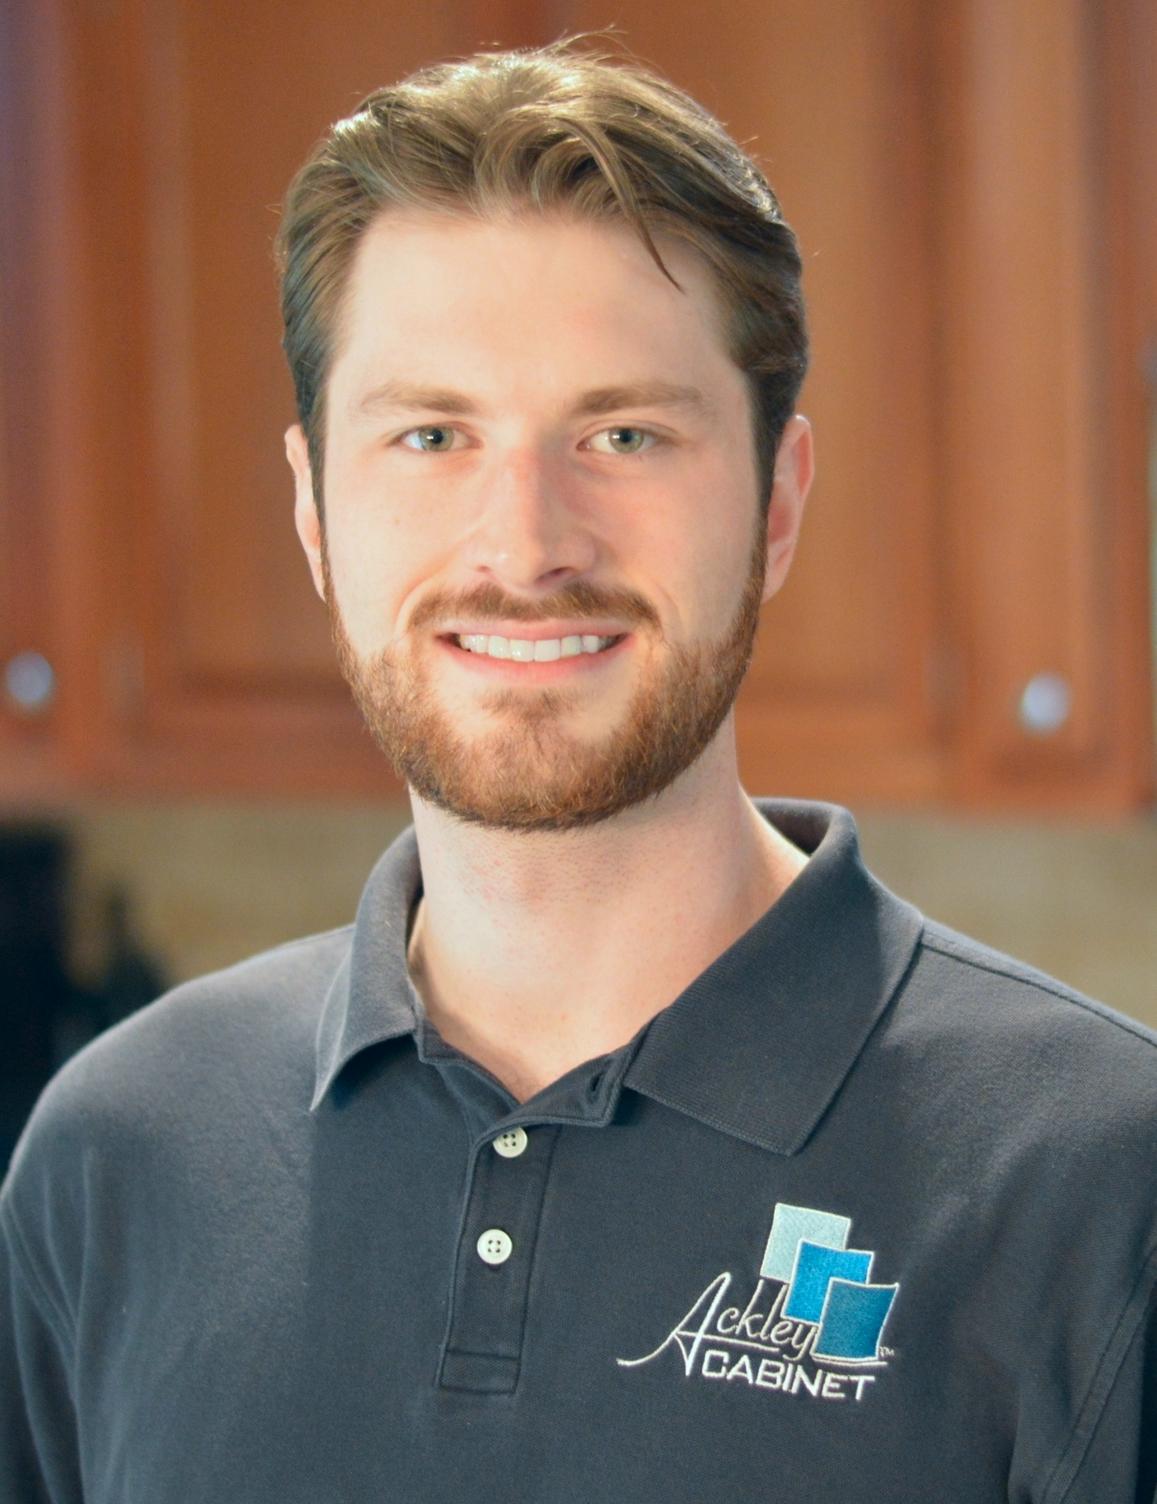 Scott Ackley- Ackley Cabinet LLC